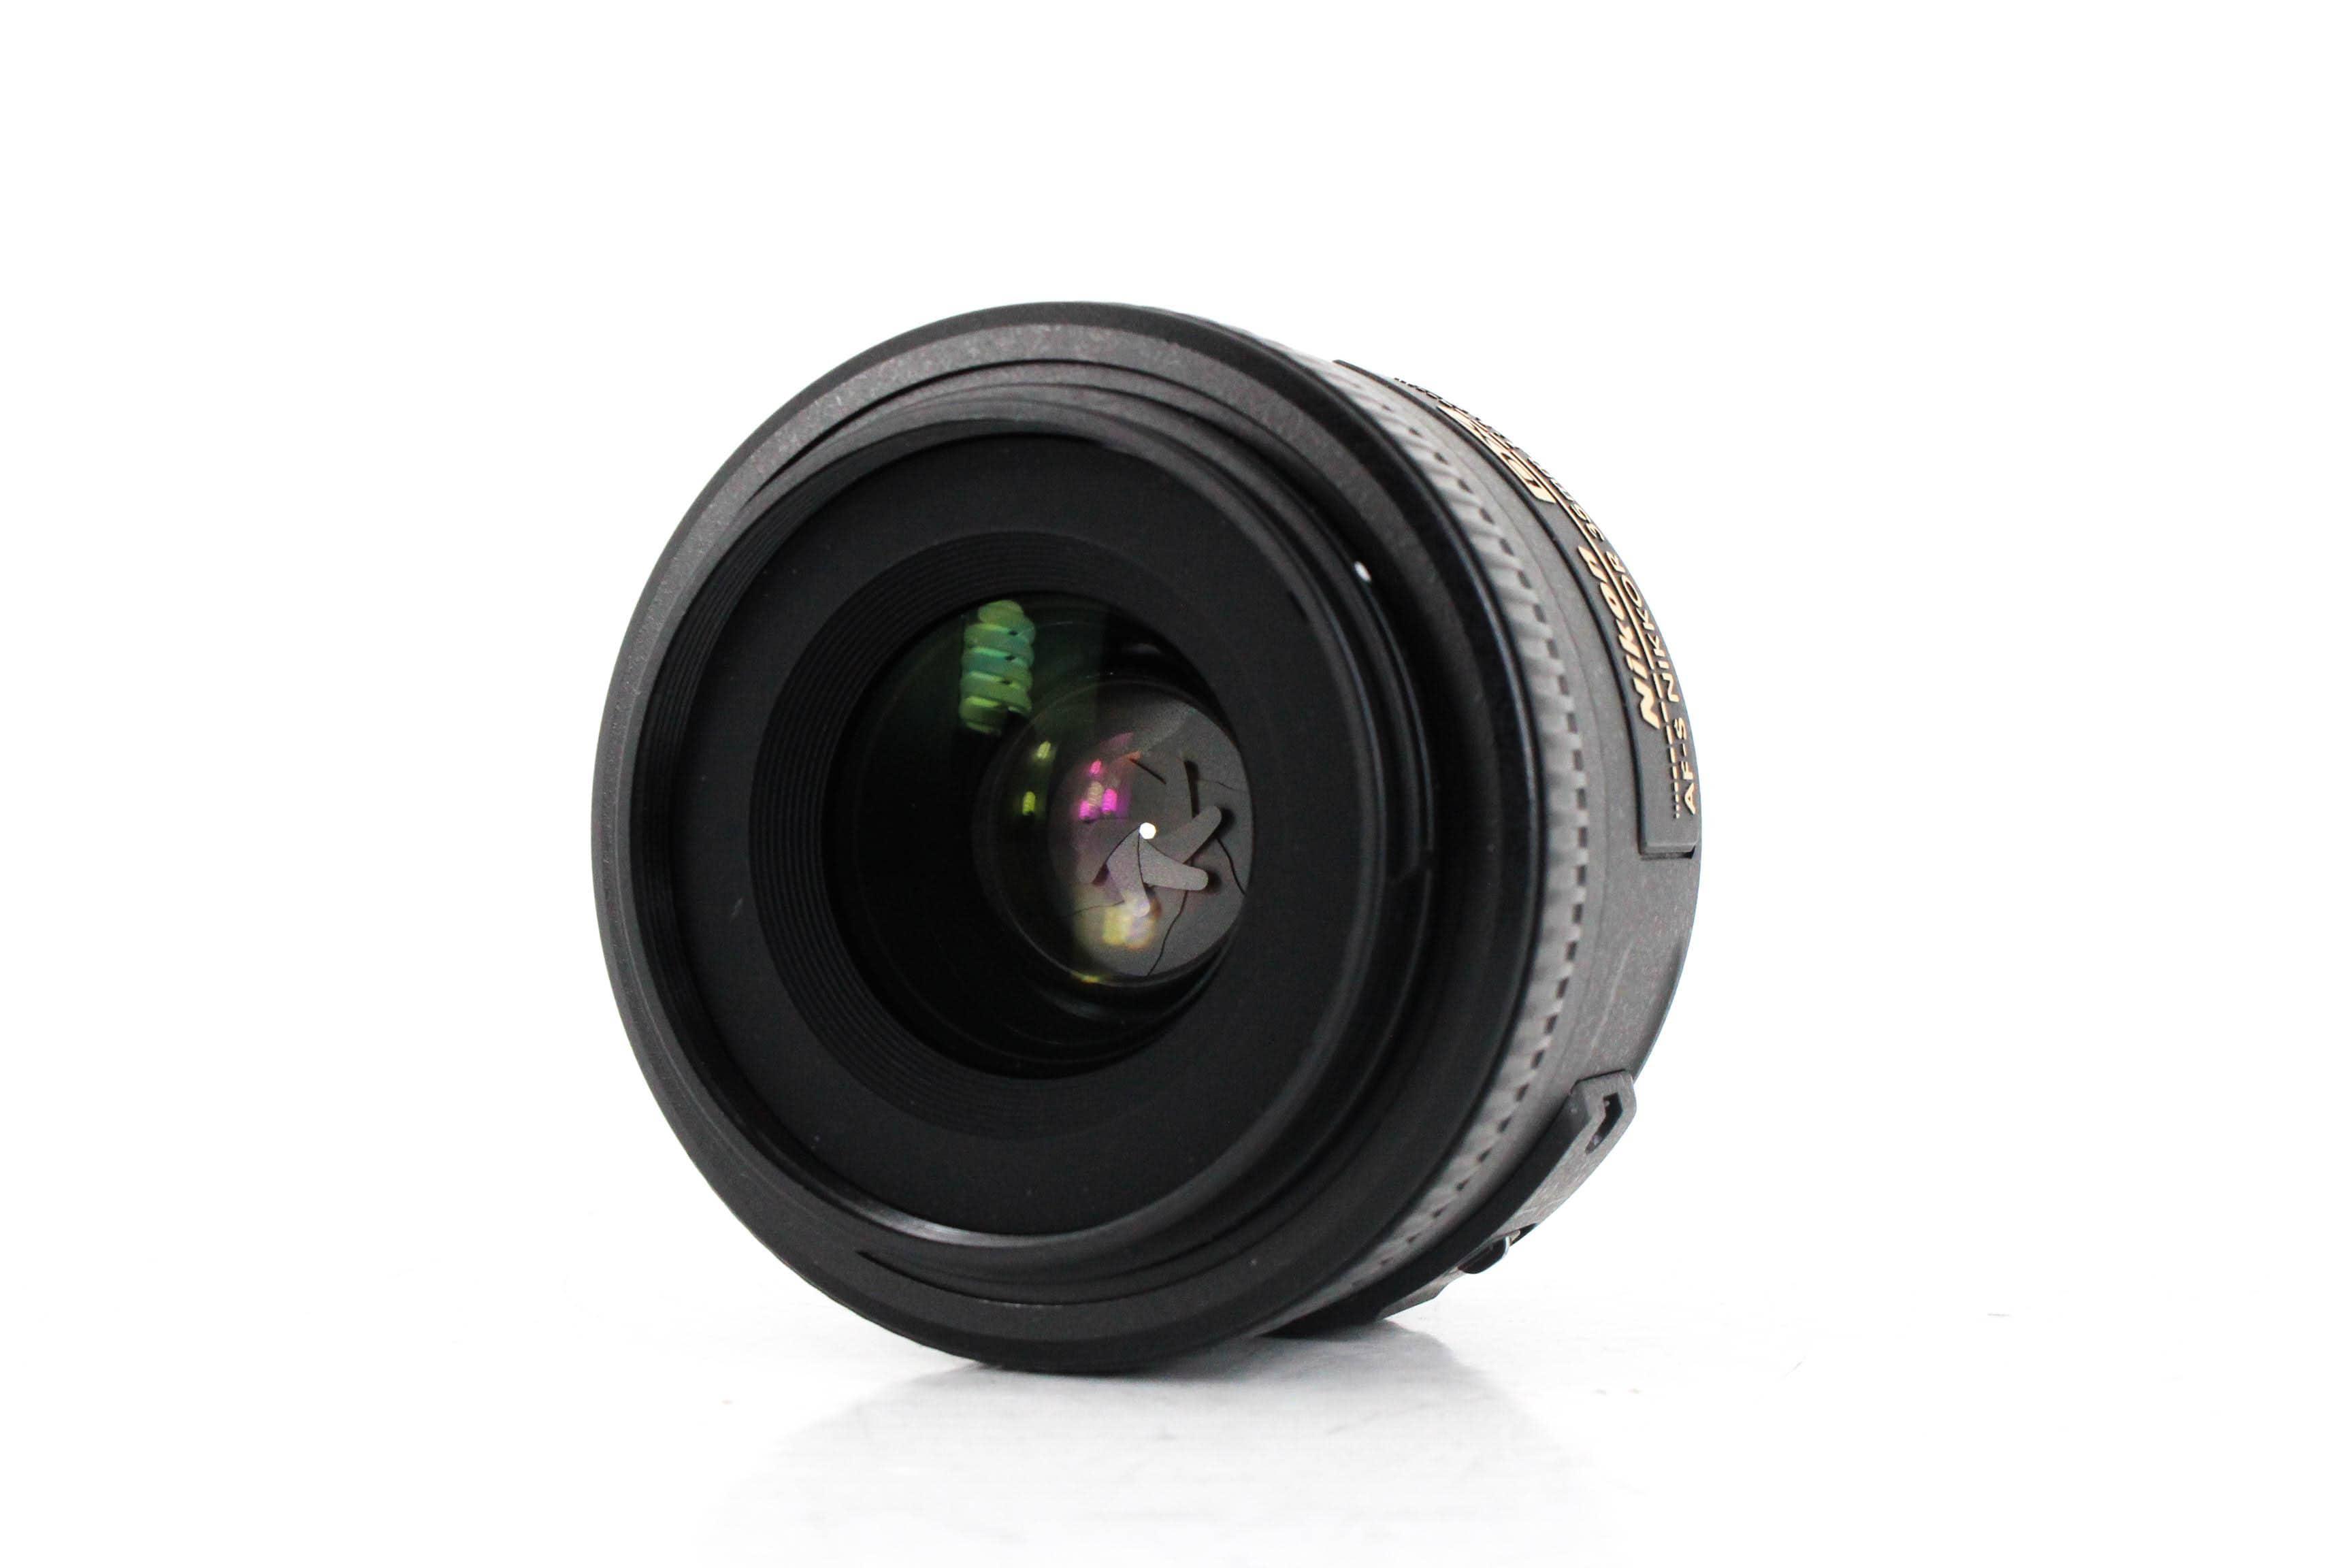 nikon35mm min image